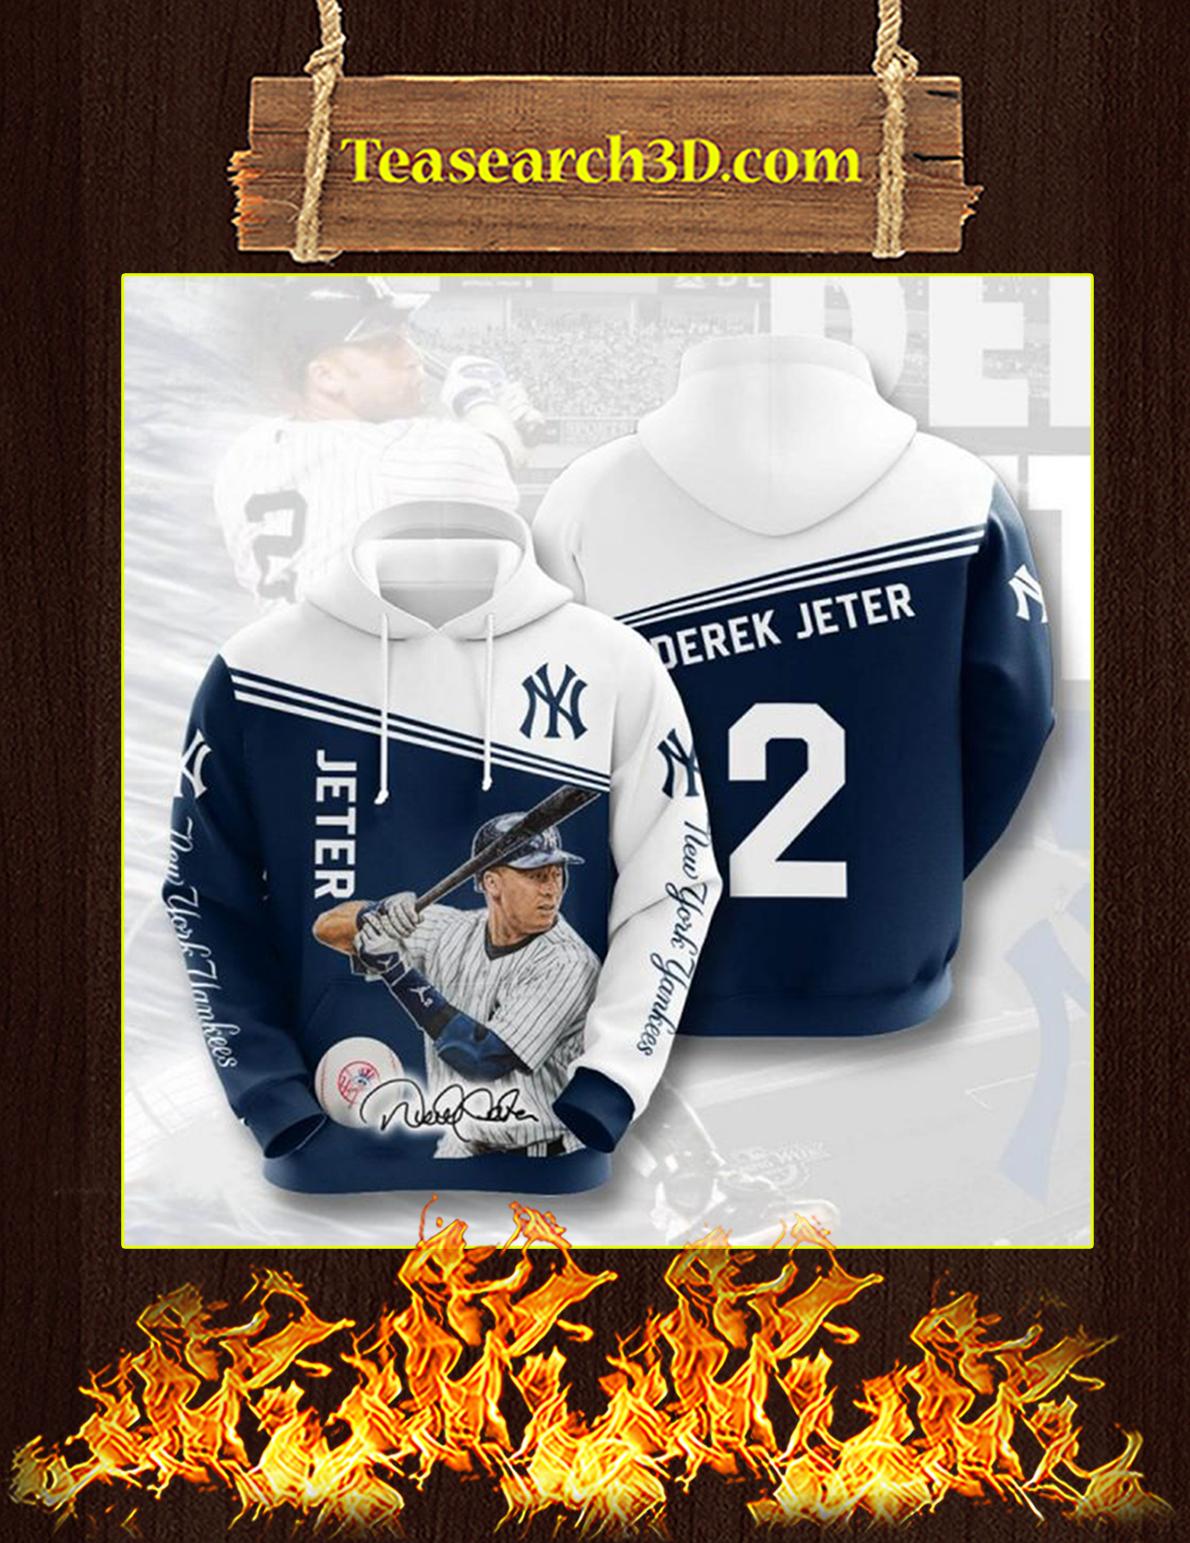 Derek Jeter New York Yankees 3D Hoodie Size XL